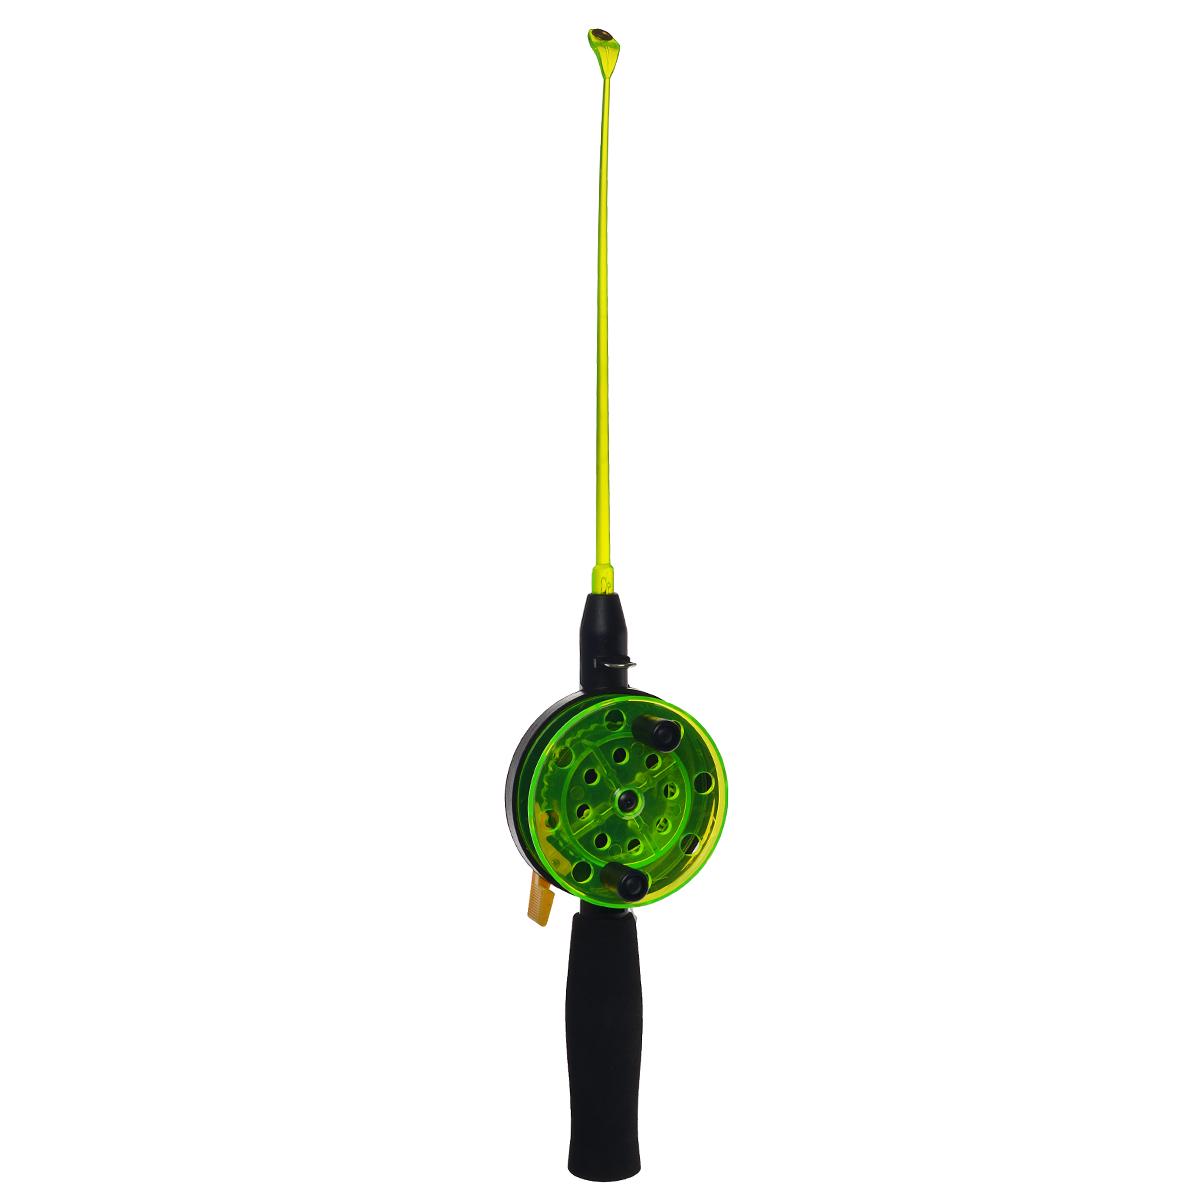 Удочка зимняя SWD HR201, цвет: черный, зеленый, 40 см. BJX0105 удочка зимняя pirs km 55m